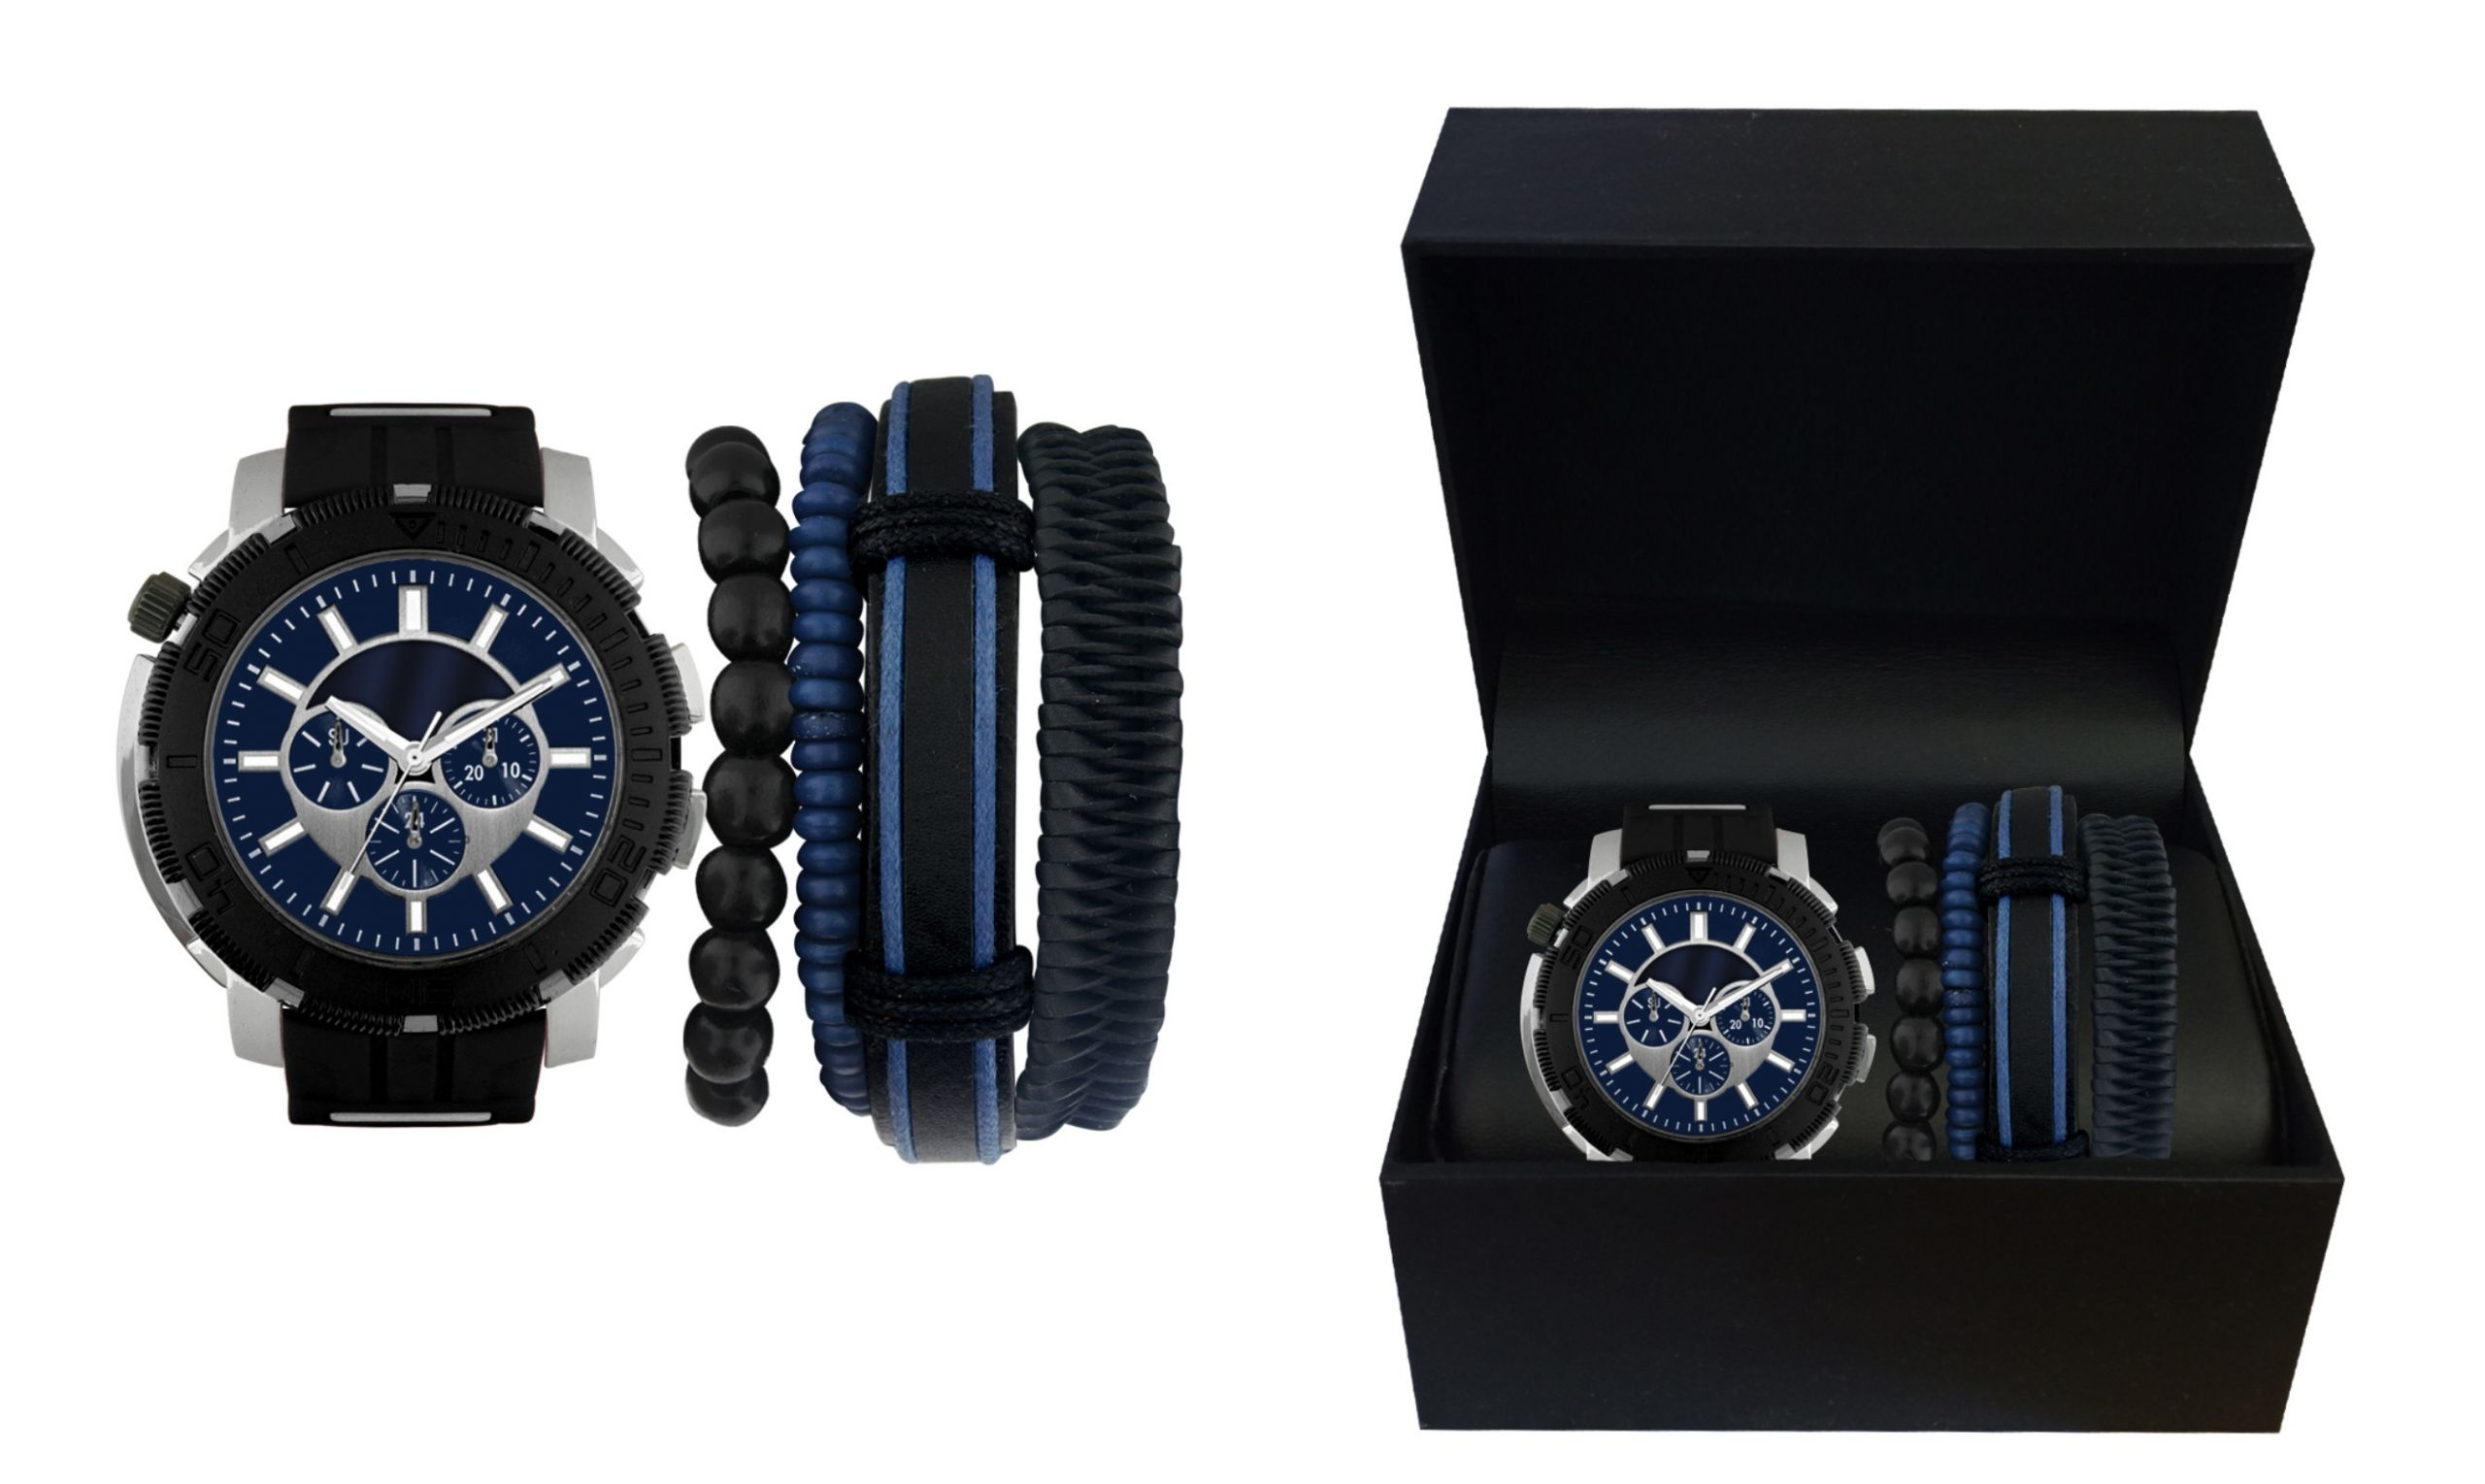 Bracelet And Watch Set  American Exchange Men s Watch and Bracelet Set Jewelry